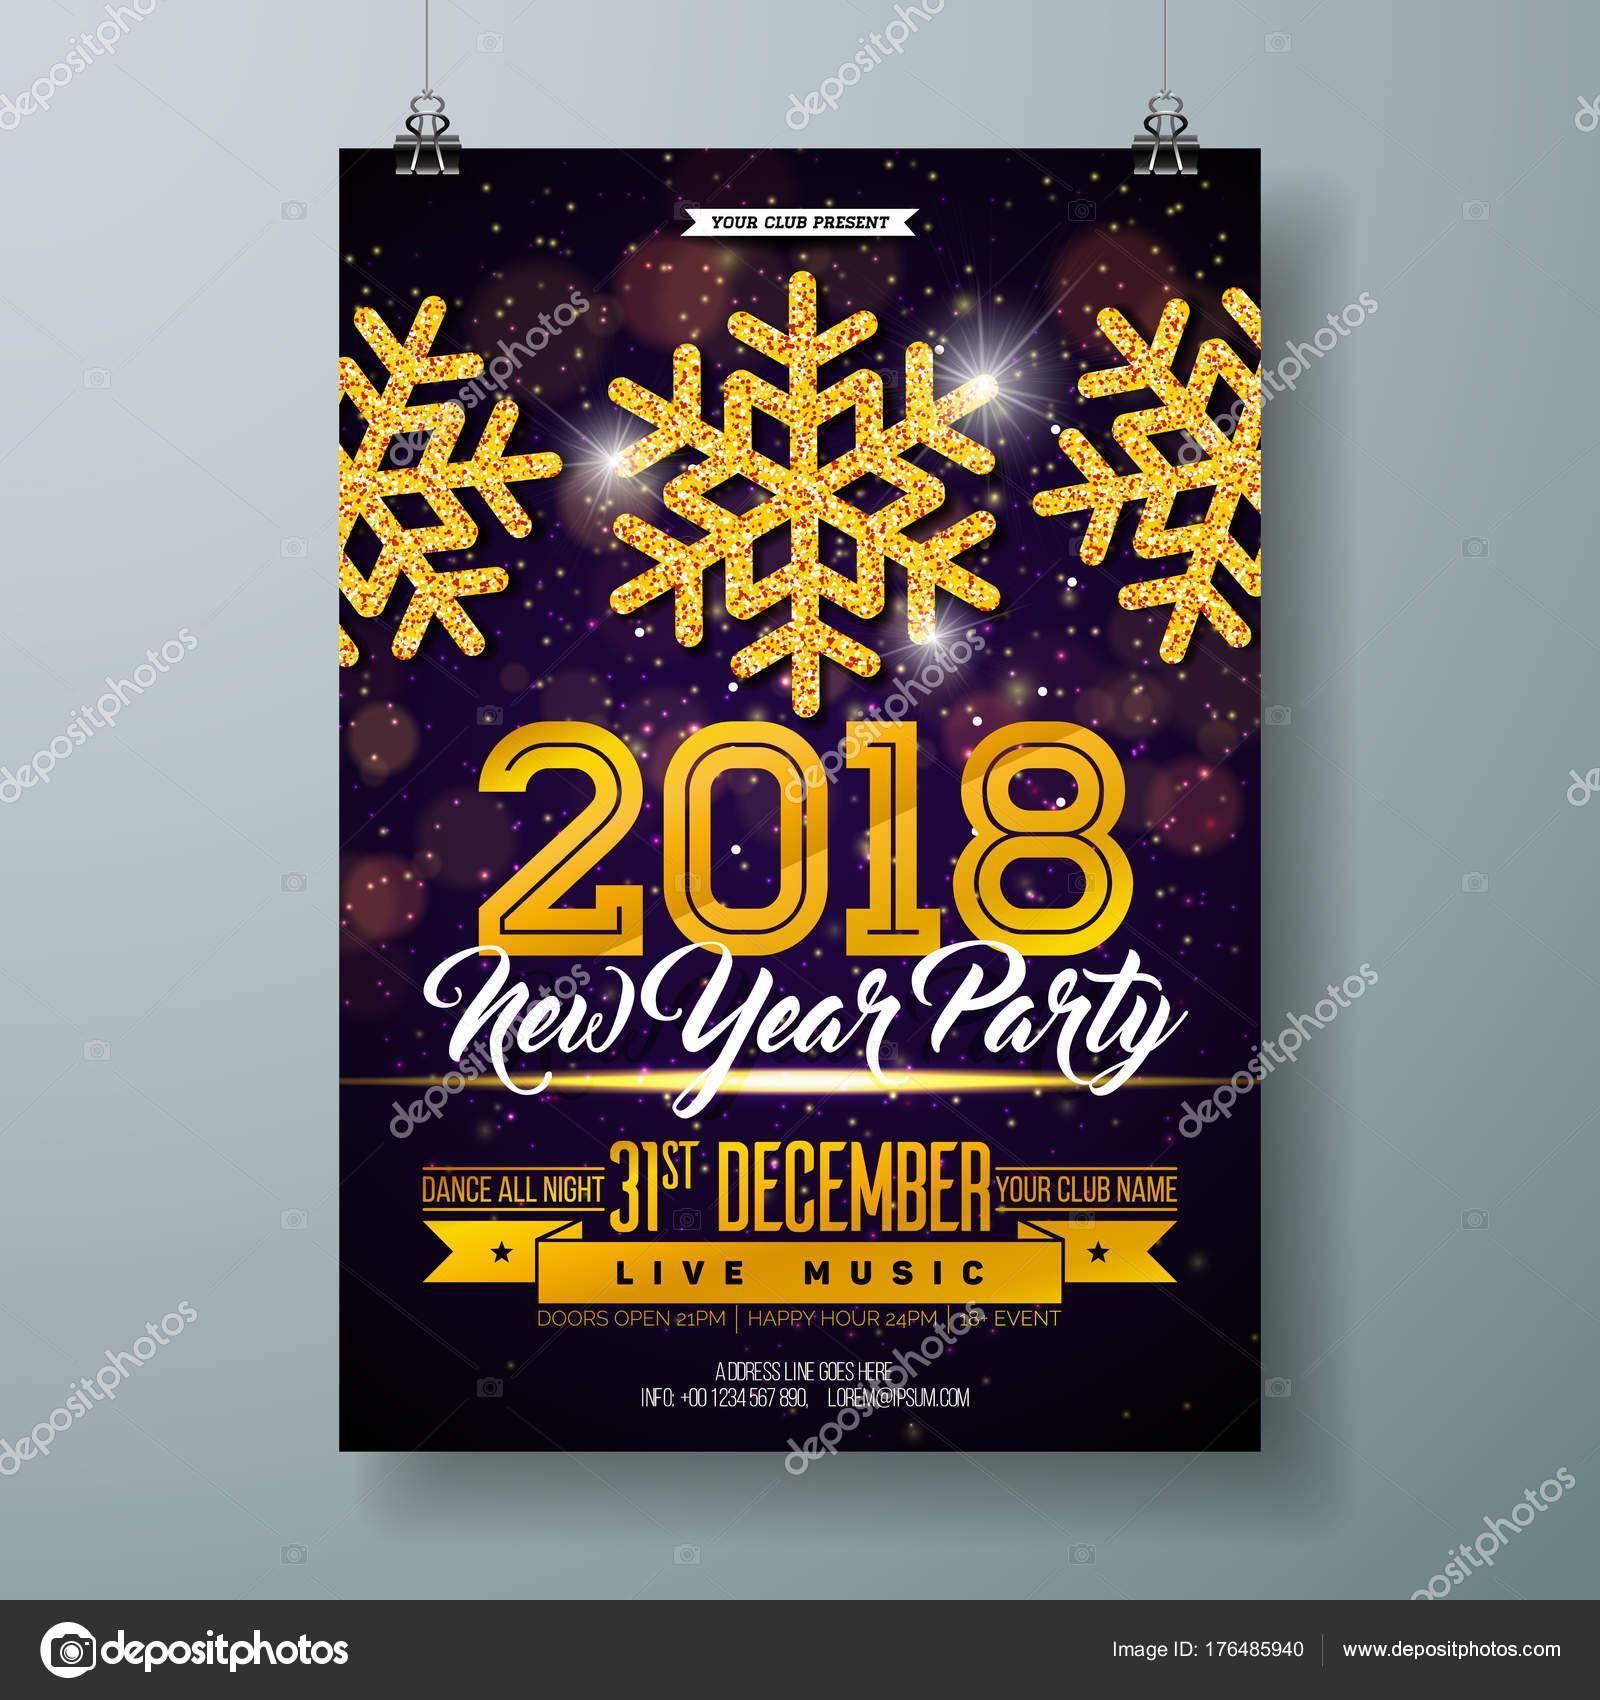 silvester party feier plakat vorlage abbildung 3d 2018. Black Bedroom Furniture Sets. Home Design Ideas